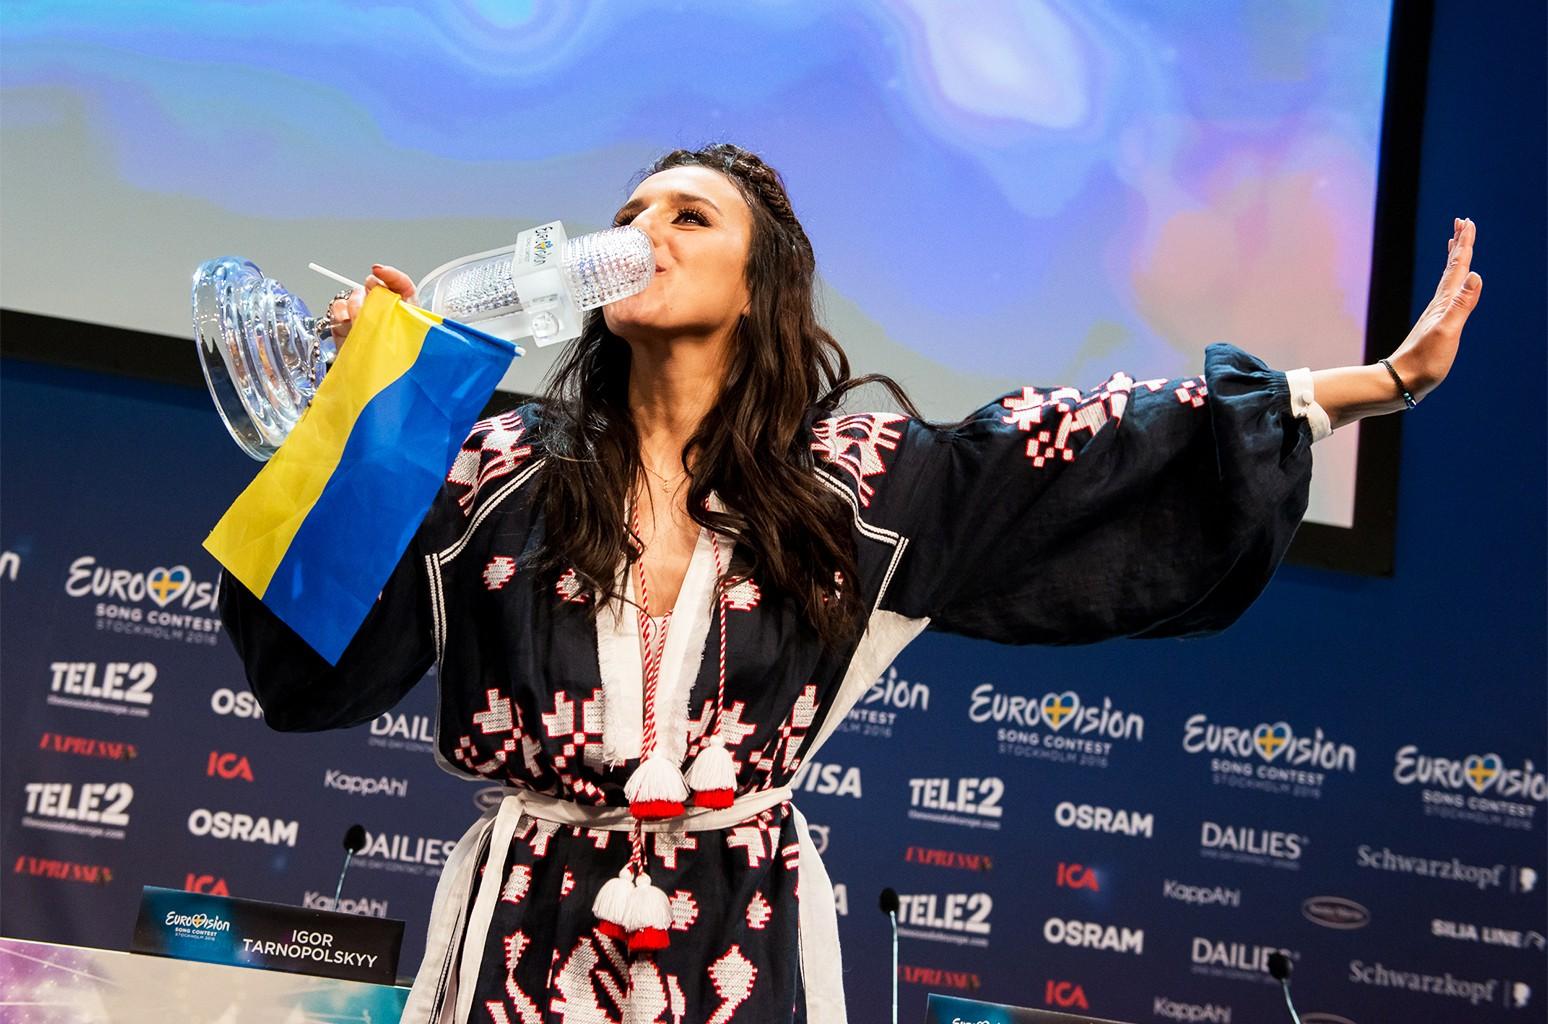 The 2016 Eurovision Song Contest winner, Jamala of Ukraine.